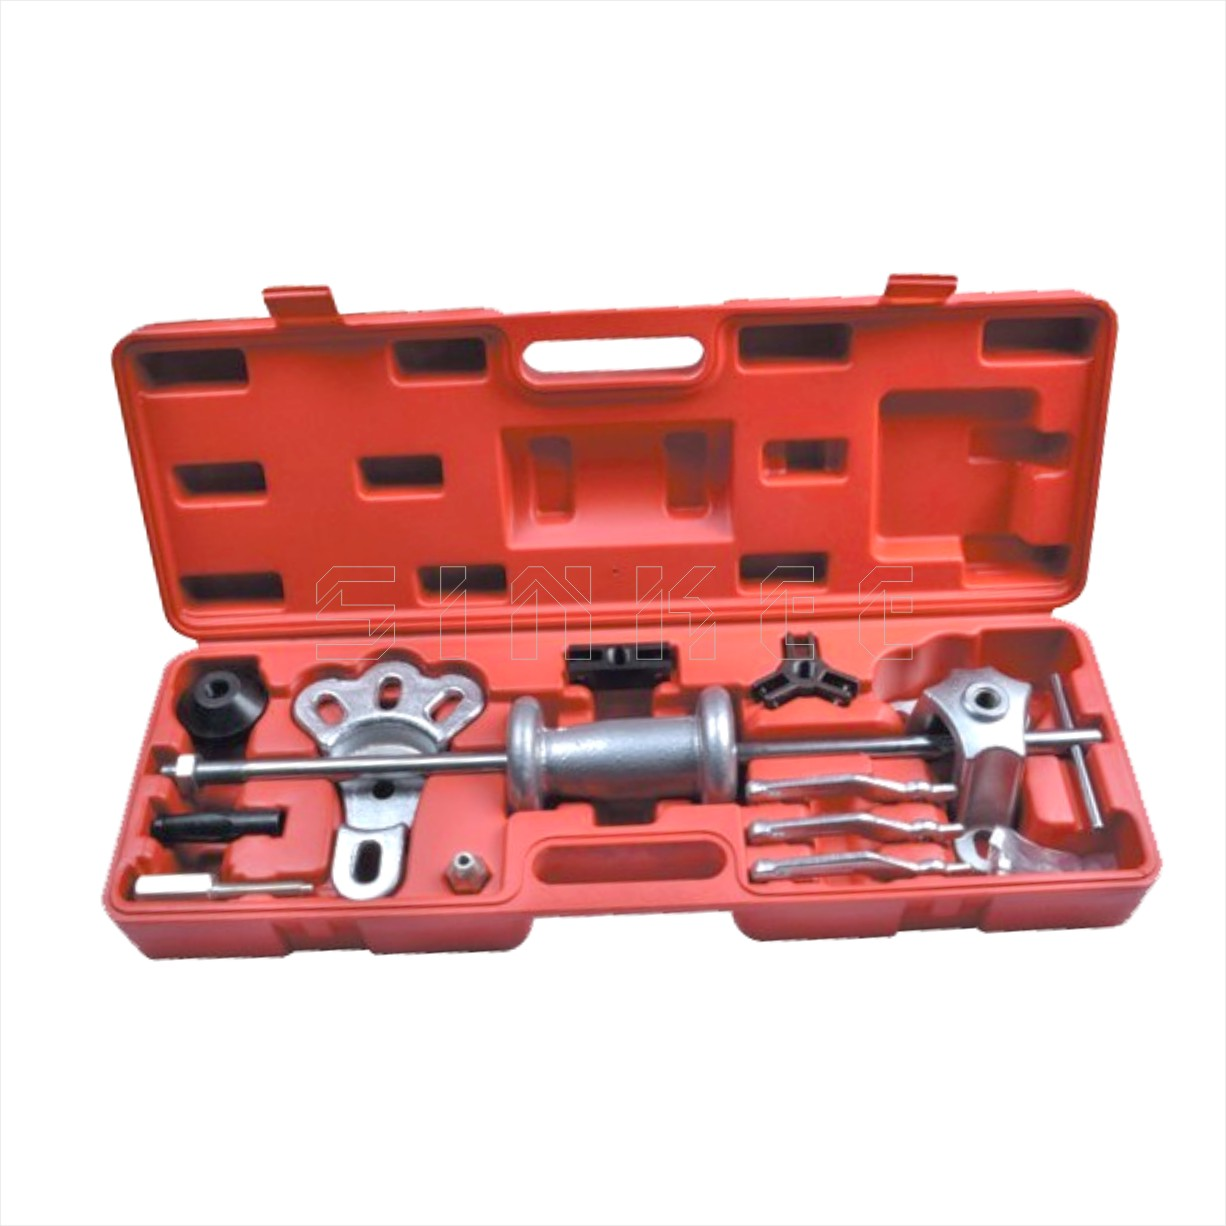 Axles Slide Hammer Puller Set 2/3 Jaw Internal/External Puller Bearing Remover Tool Set SK1152 winmax 6 gear puller 3 jaw set gear pulley bearing puller auto tool